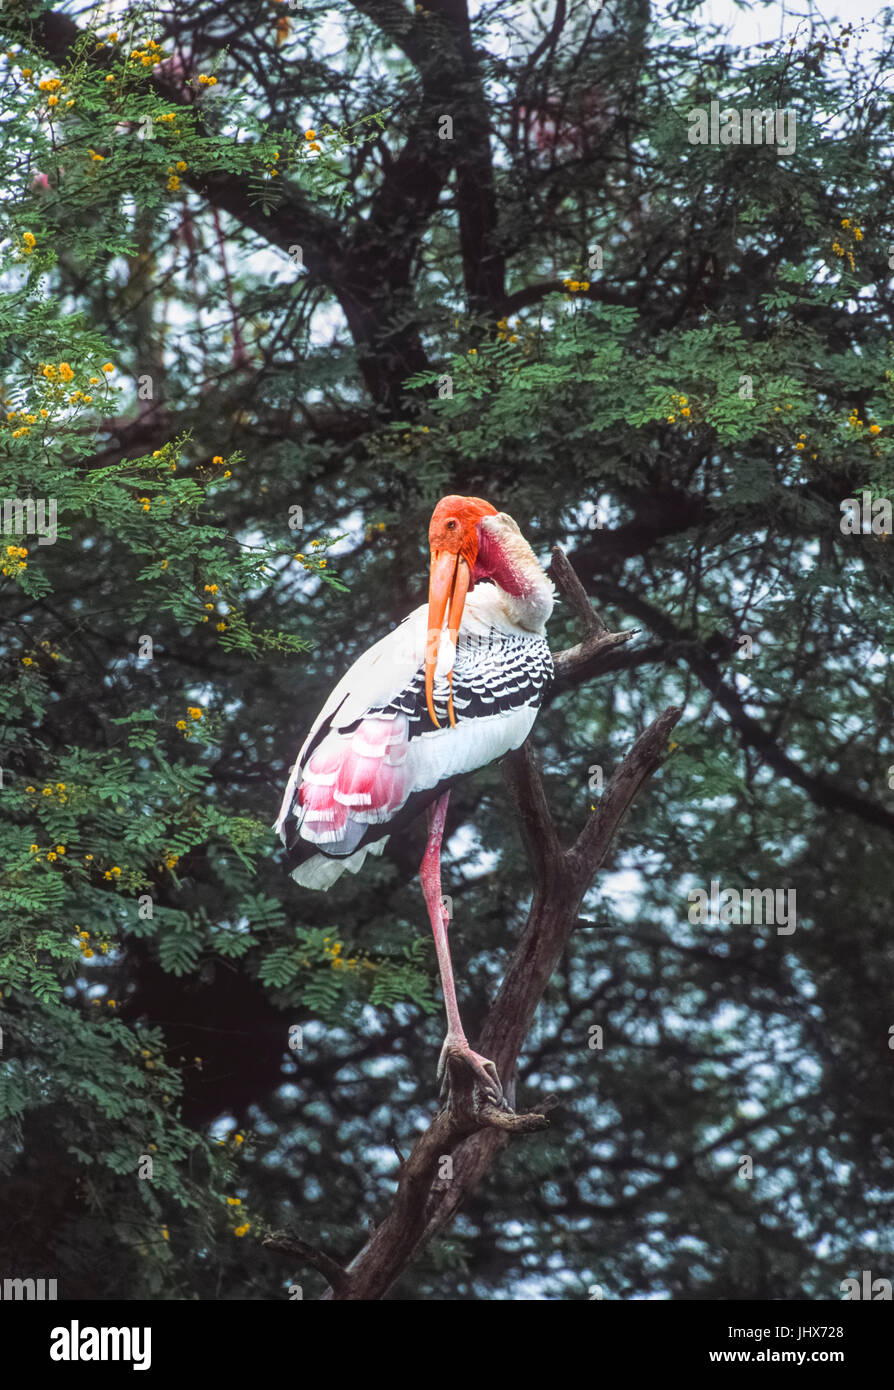 Painted Stork, (Mycteria leucocephala), Keoladeo Ghana National Park, Bharatpur, Rajasthan, India - Stock Image